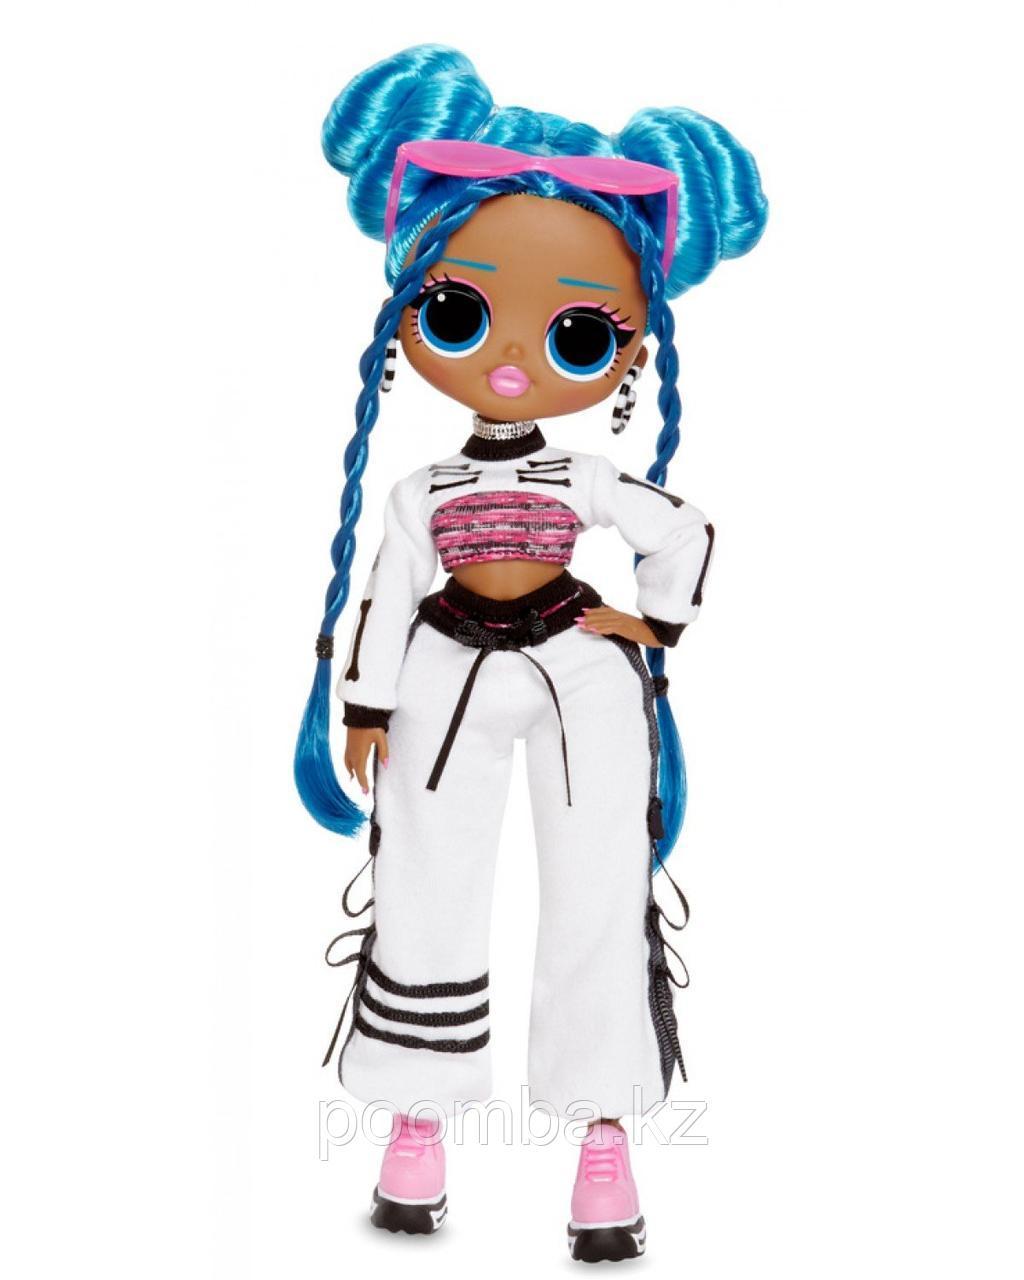 L.O.L. Кукла OMG 3 серия - Chillax